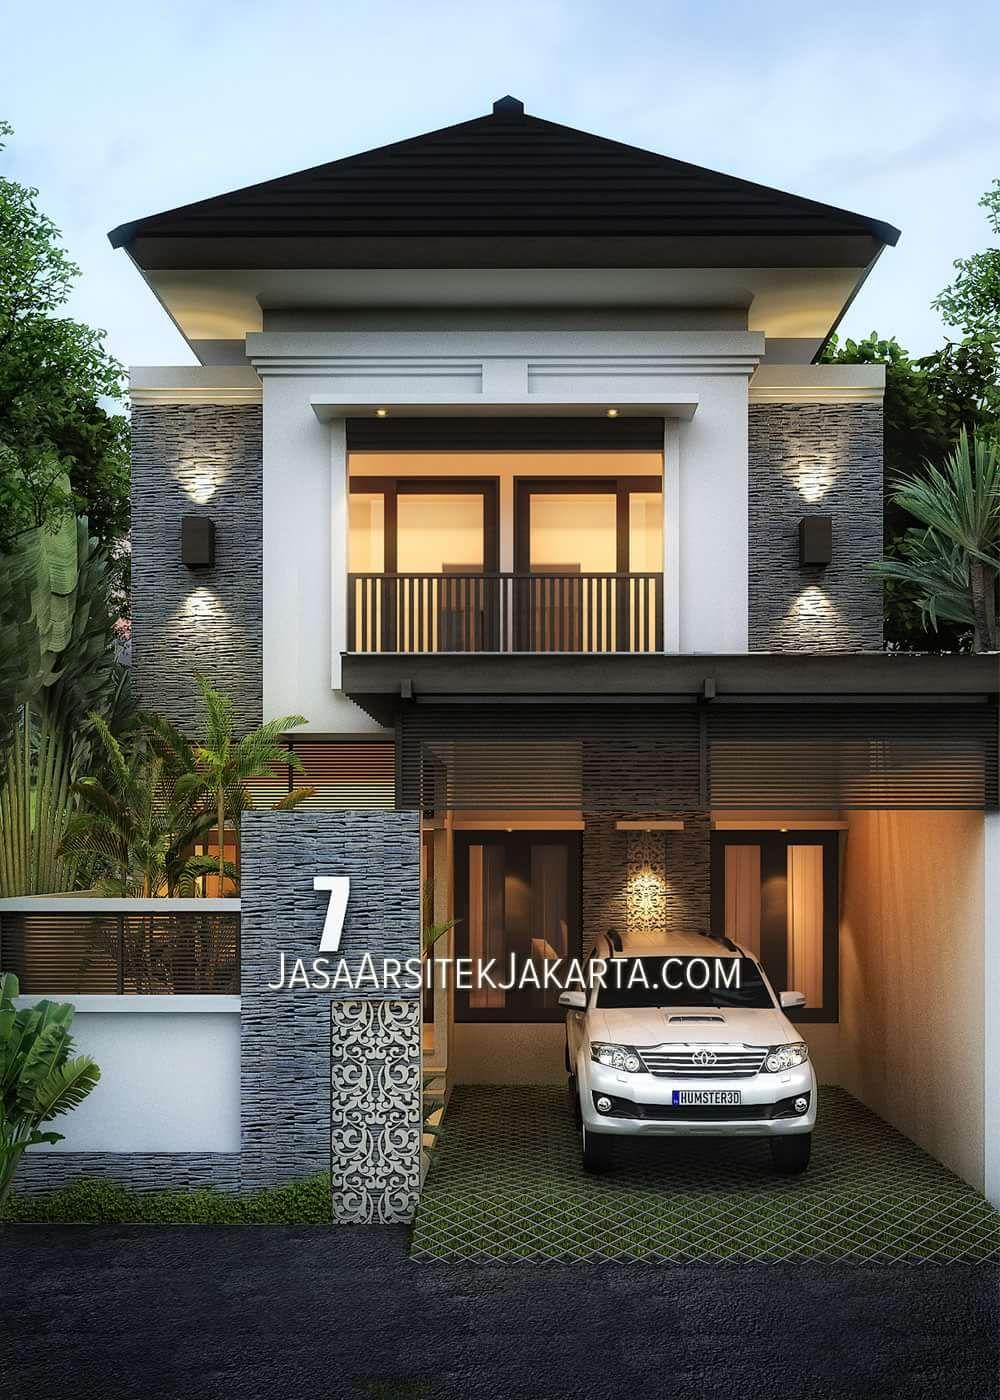 Desain Rumah Pak Sholla JasaArsitekJakarta WM Min Ngi Nh Hin